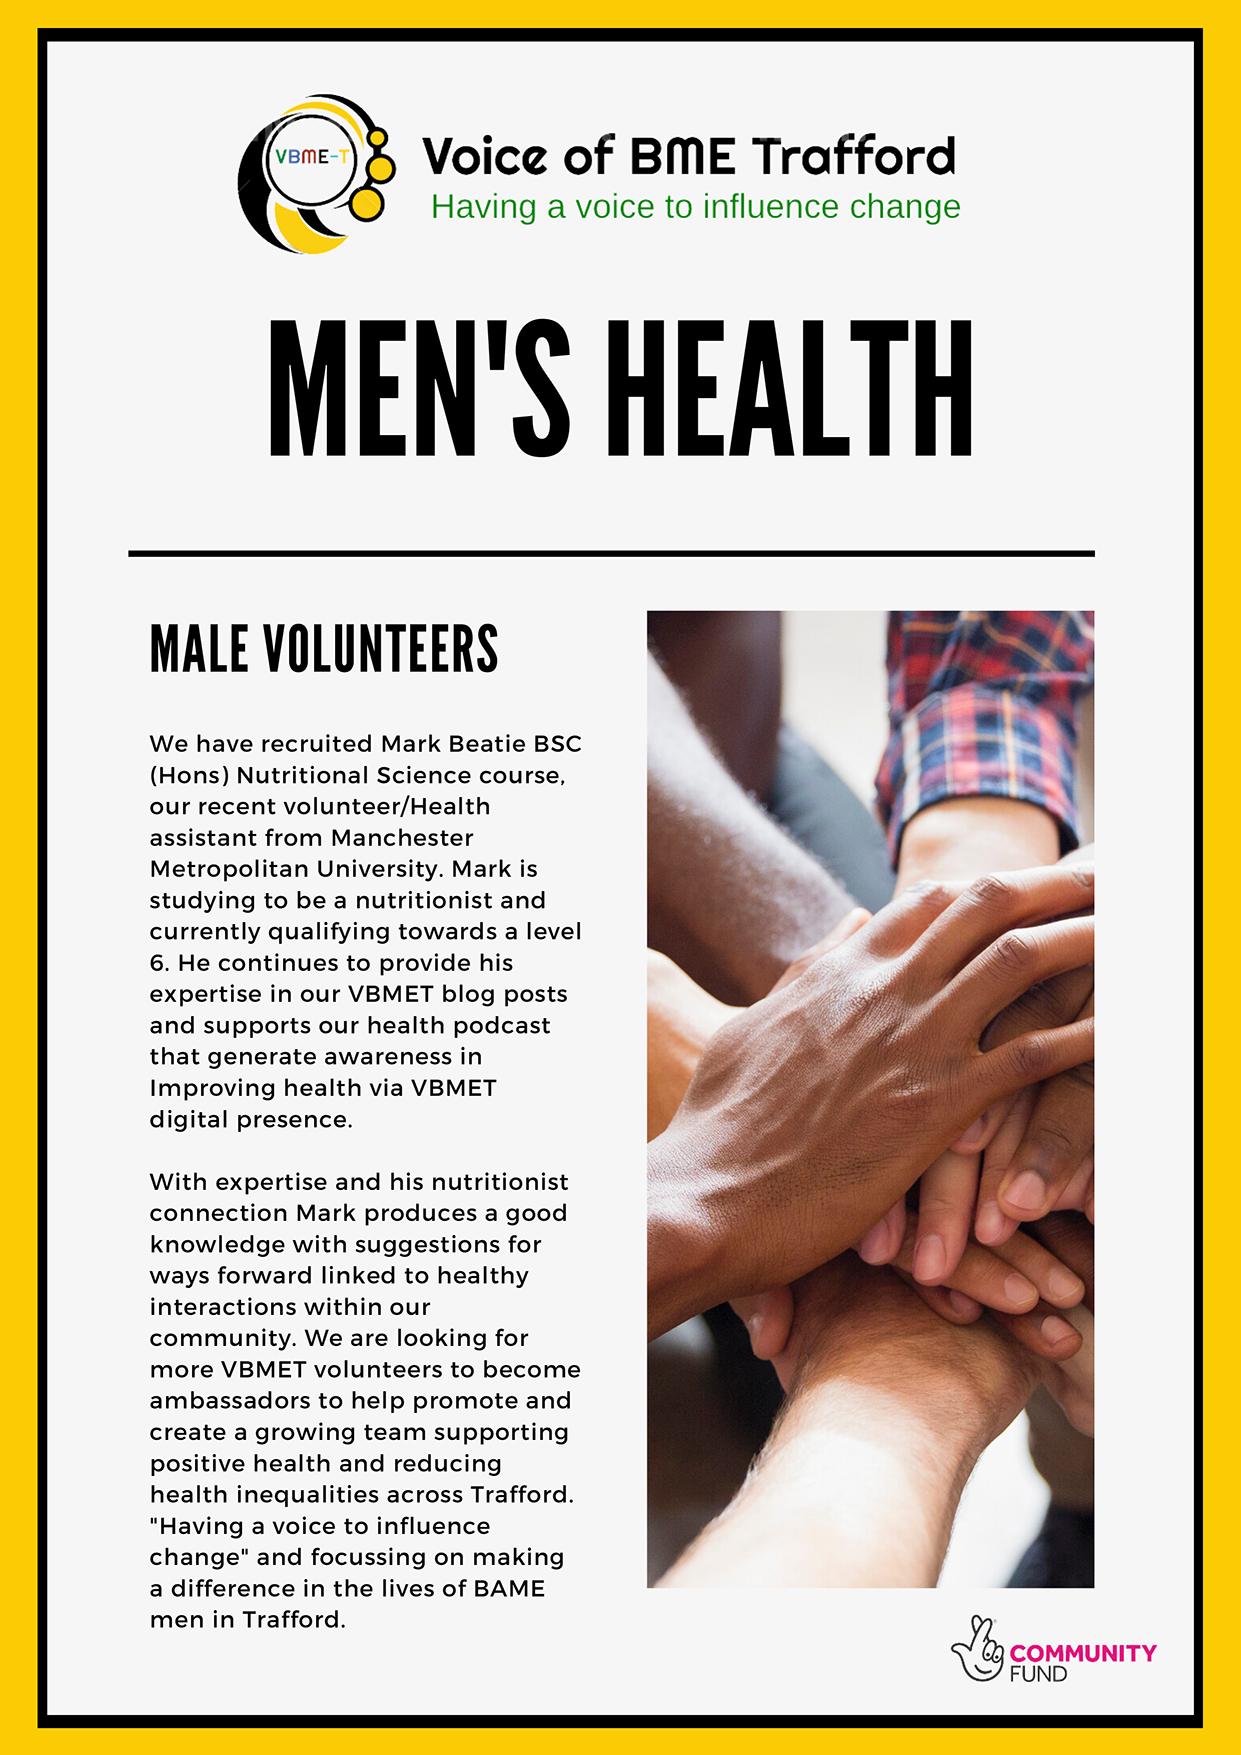 https://voicebmet.co.uk/home/wp-content/uploads/2021/05/VBMET-BROCHURE-Mens-Health-002-3.png